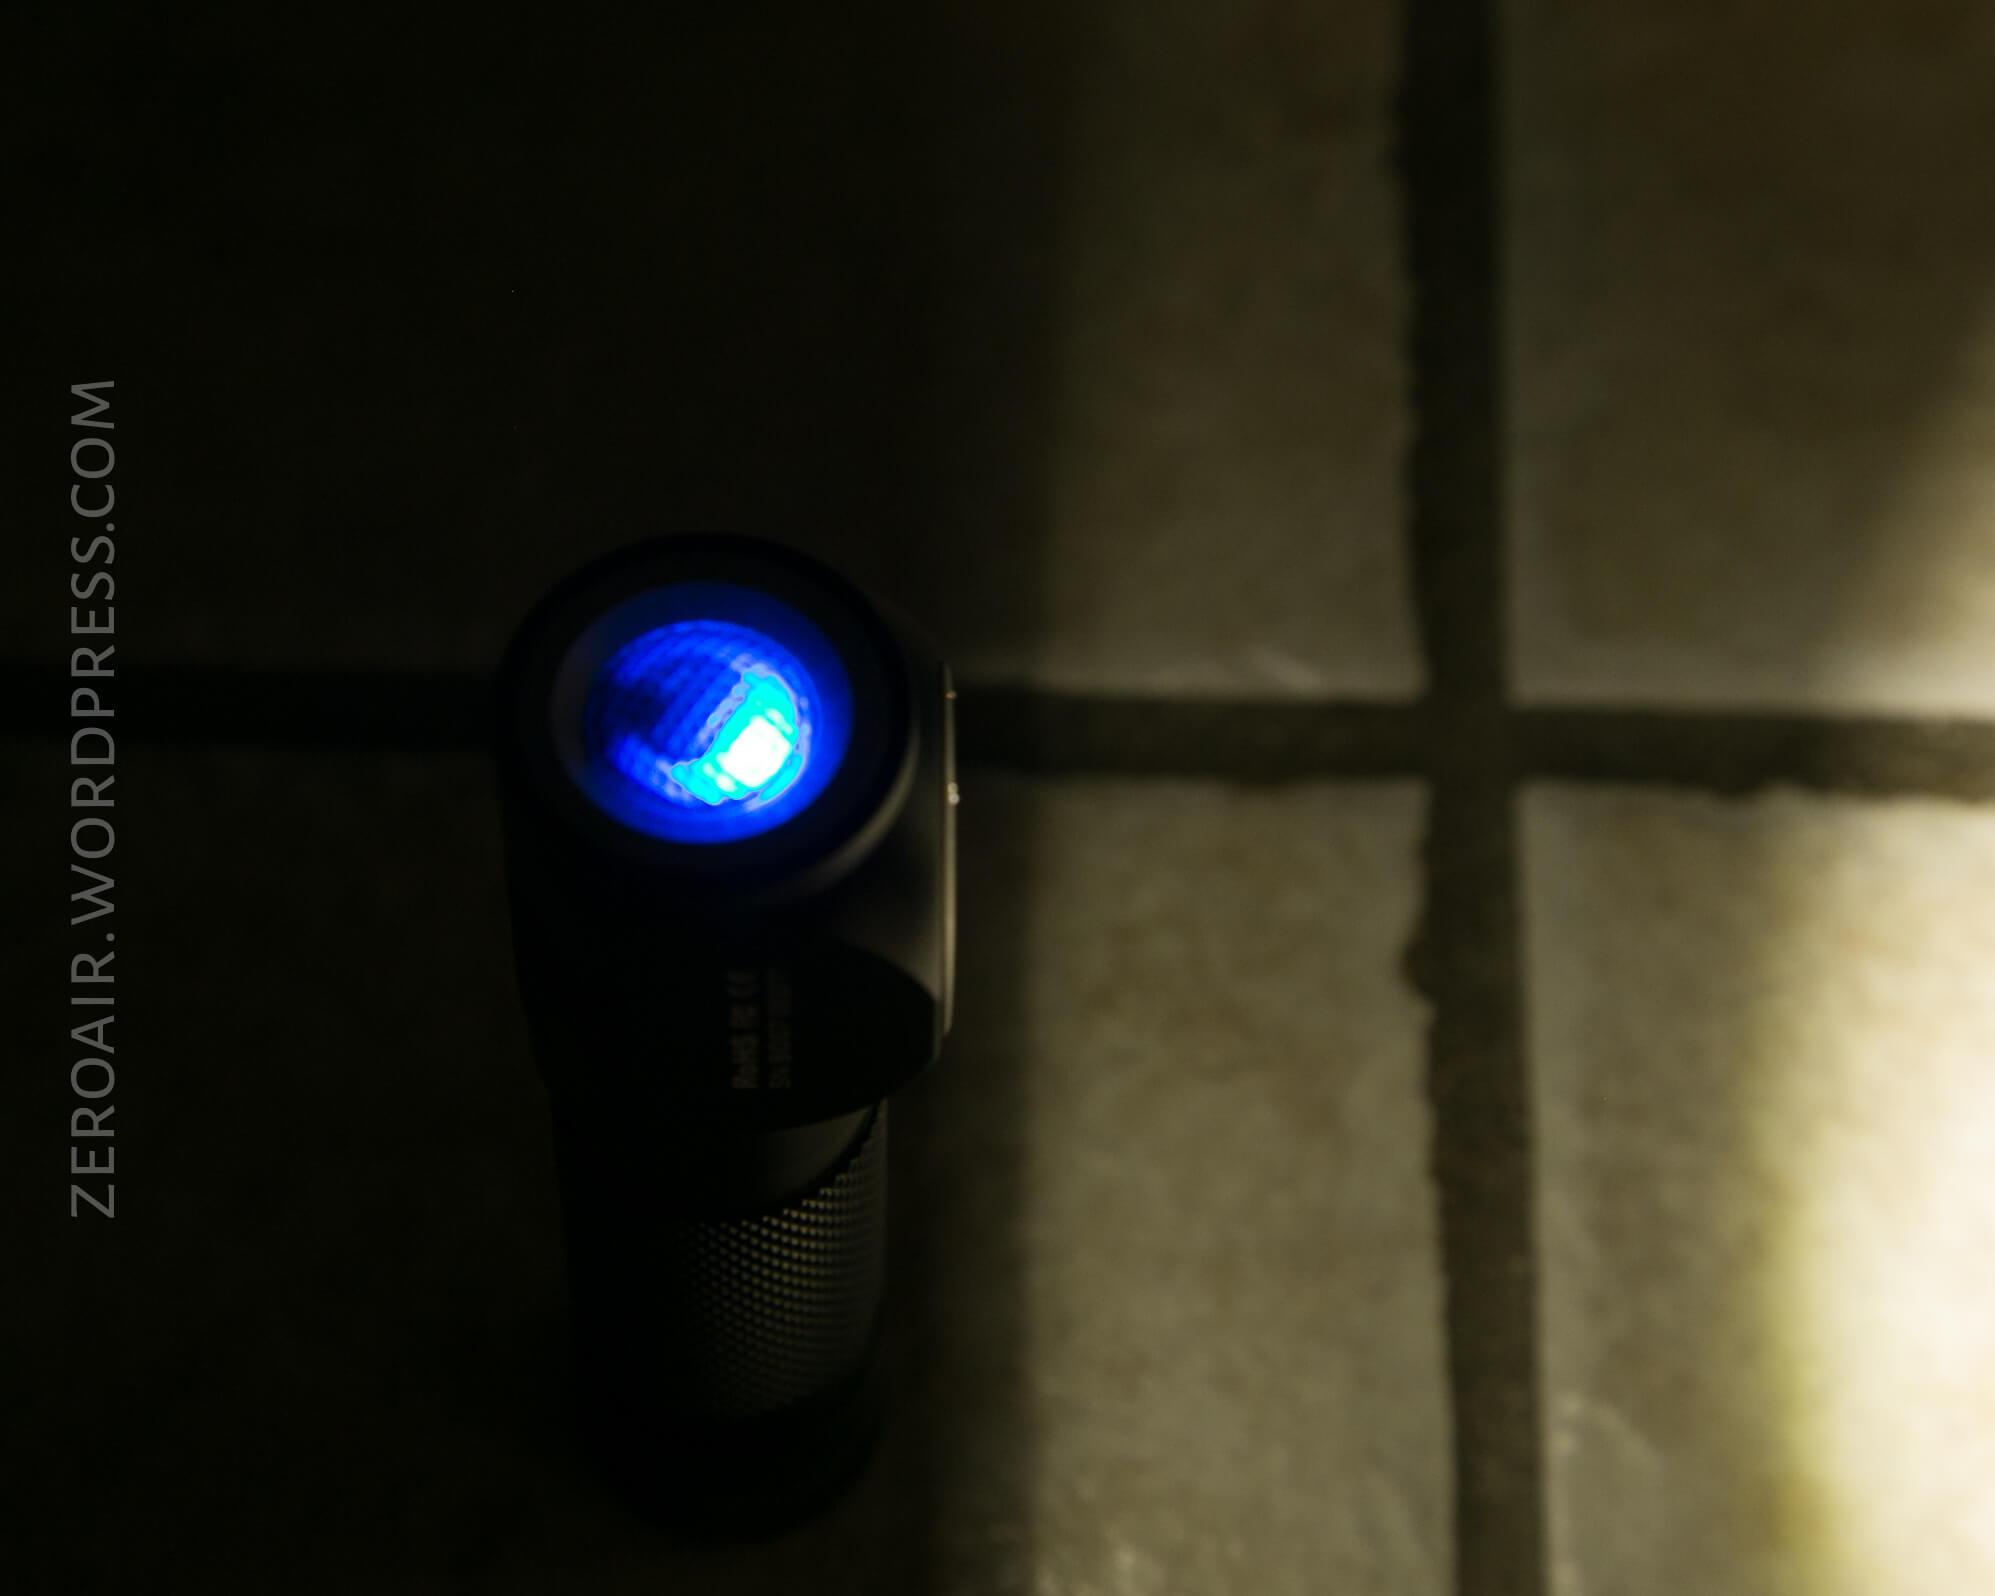 11_zeroair_reviews_thrunite_th30_headlamp.jpg